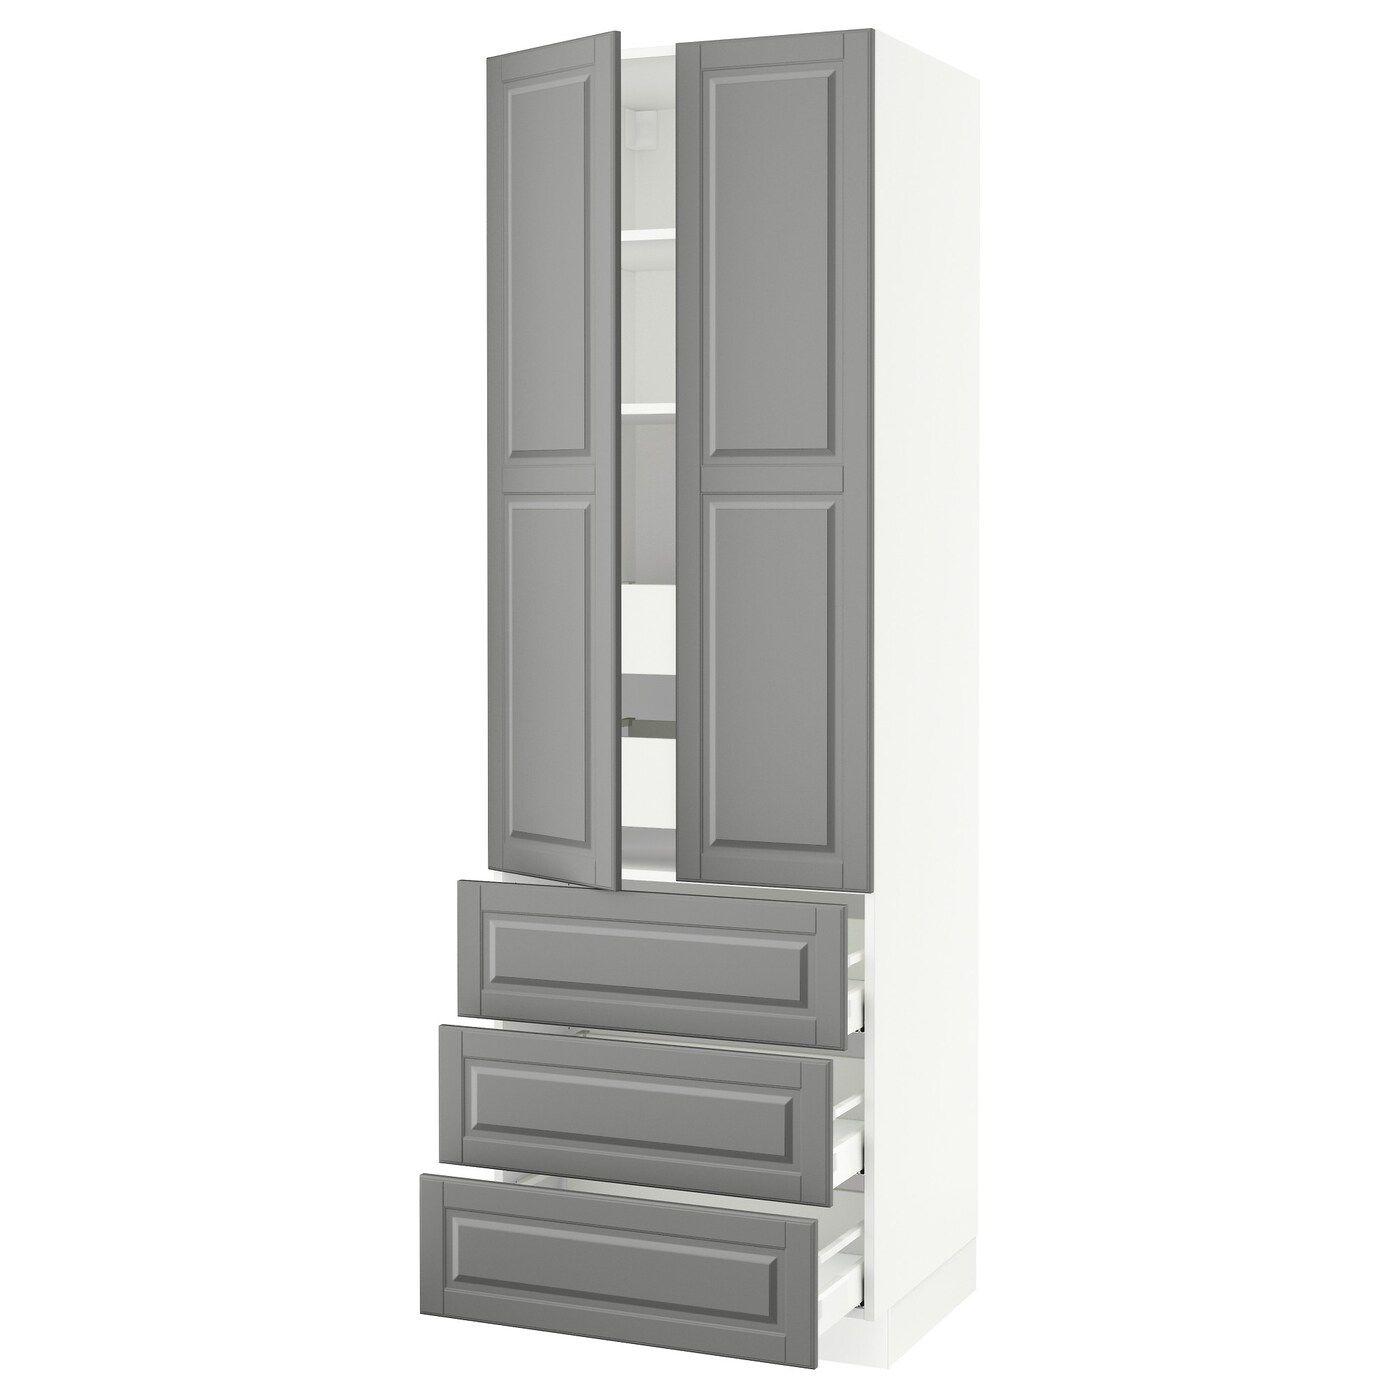 Ikea Sektion Maximera White Bodbyn Gray High Cab W 2 Drs 3